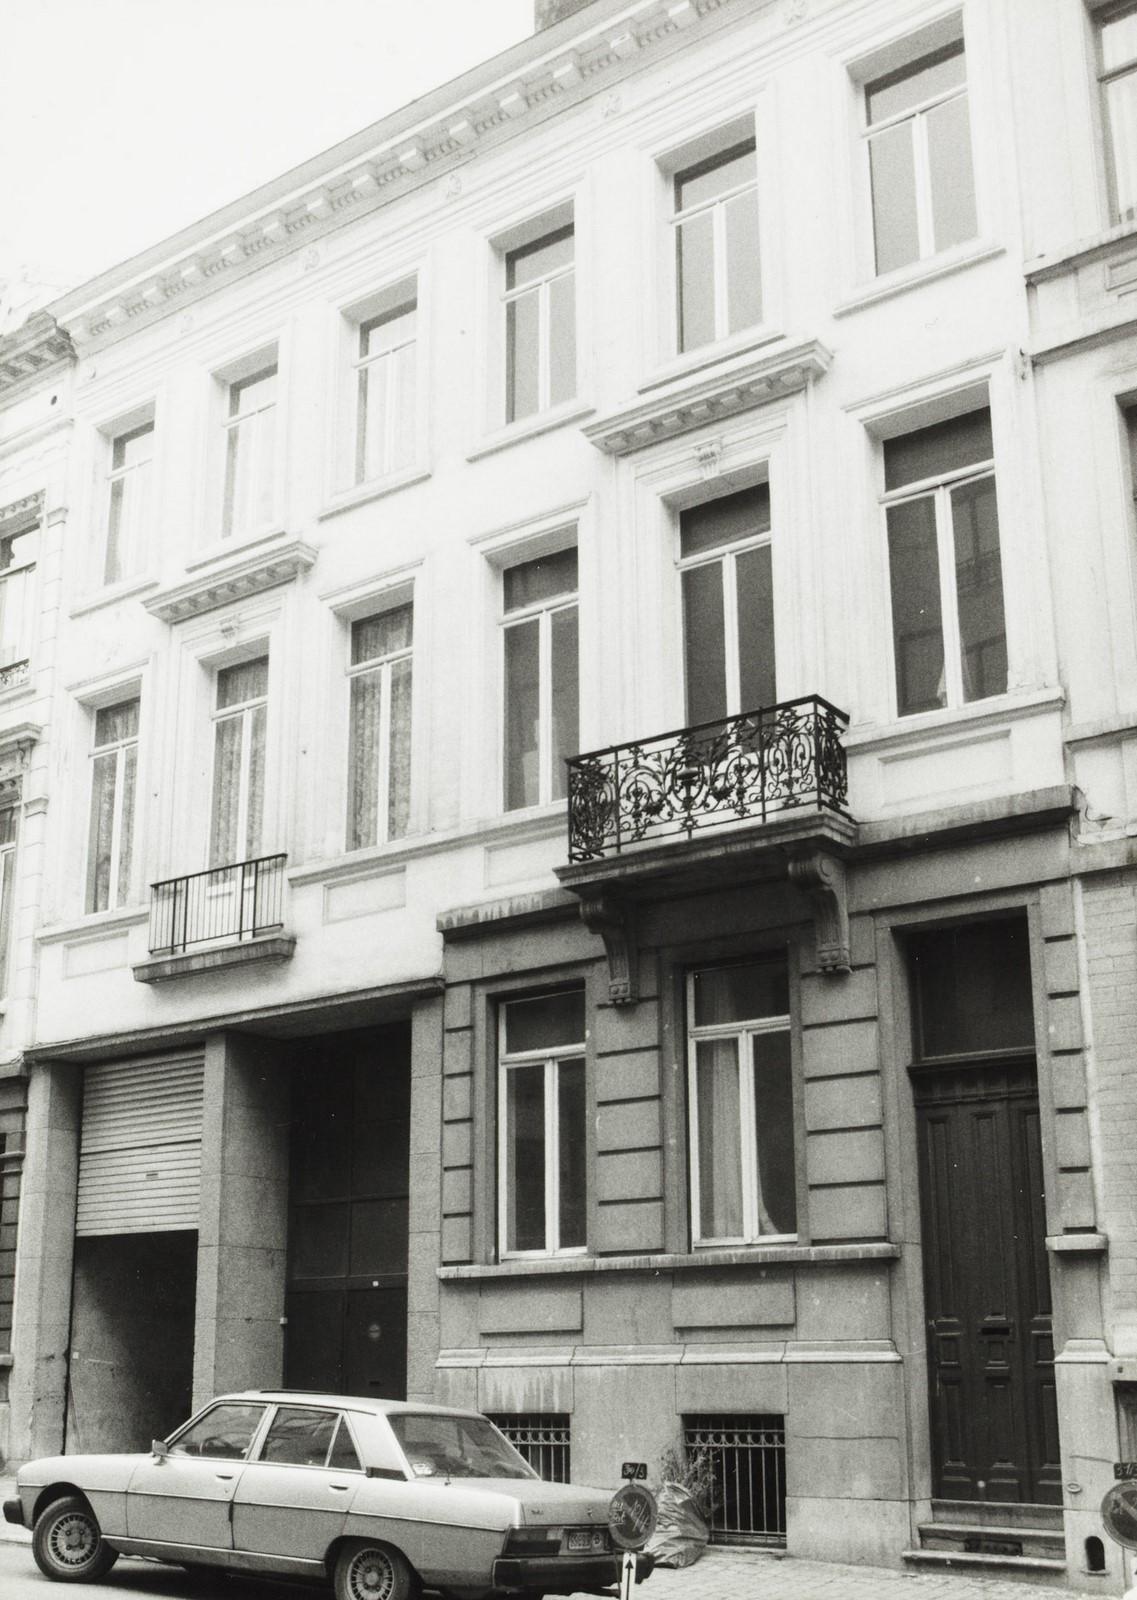 rue de la Presse 15-17., 1981